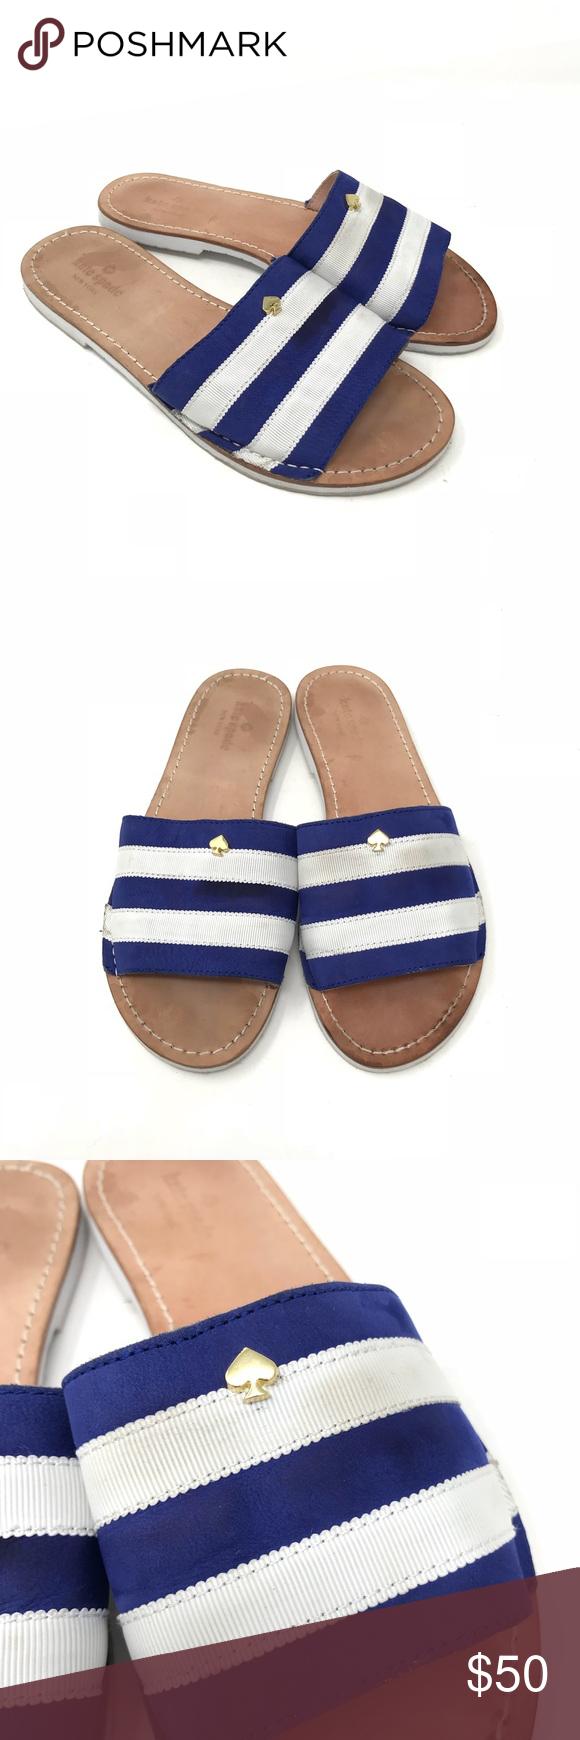 264cd9c9f771 Kate Spade Sandal Imperiale Grosgrain Stripe Slide Kate Spade New York  Sandals Size 7.5 Imperiale Blue White Grosgrain Stripe Slide White shows  graying